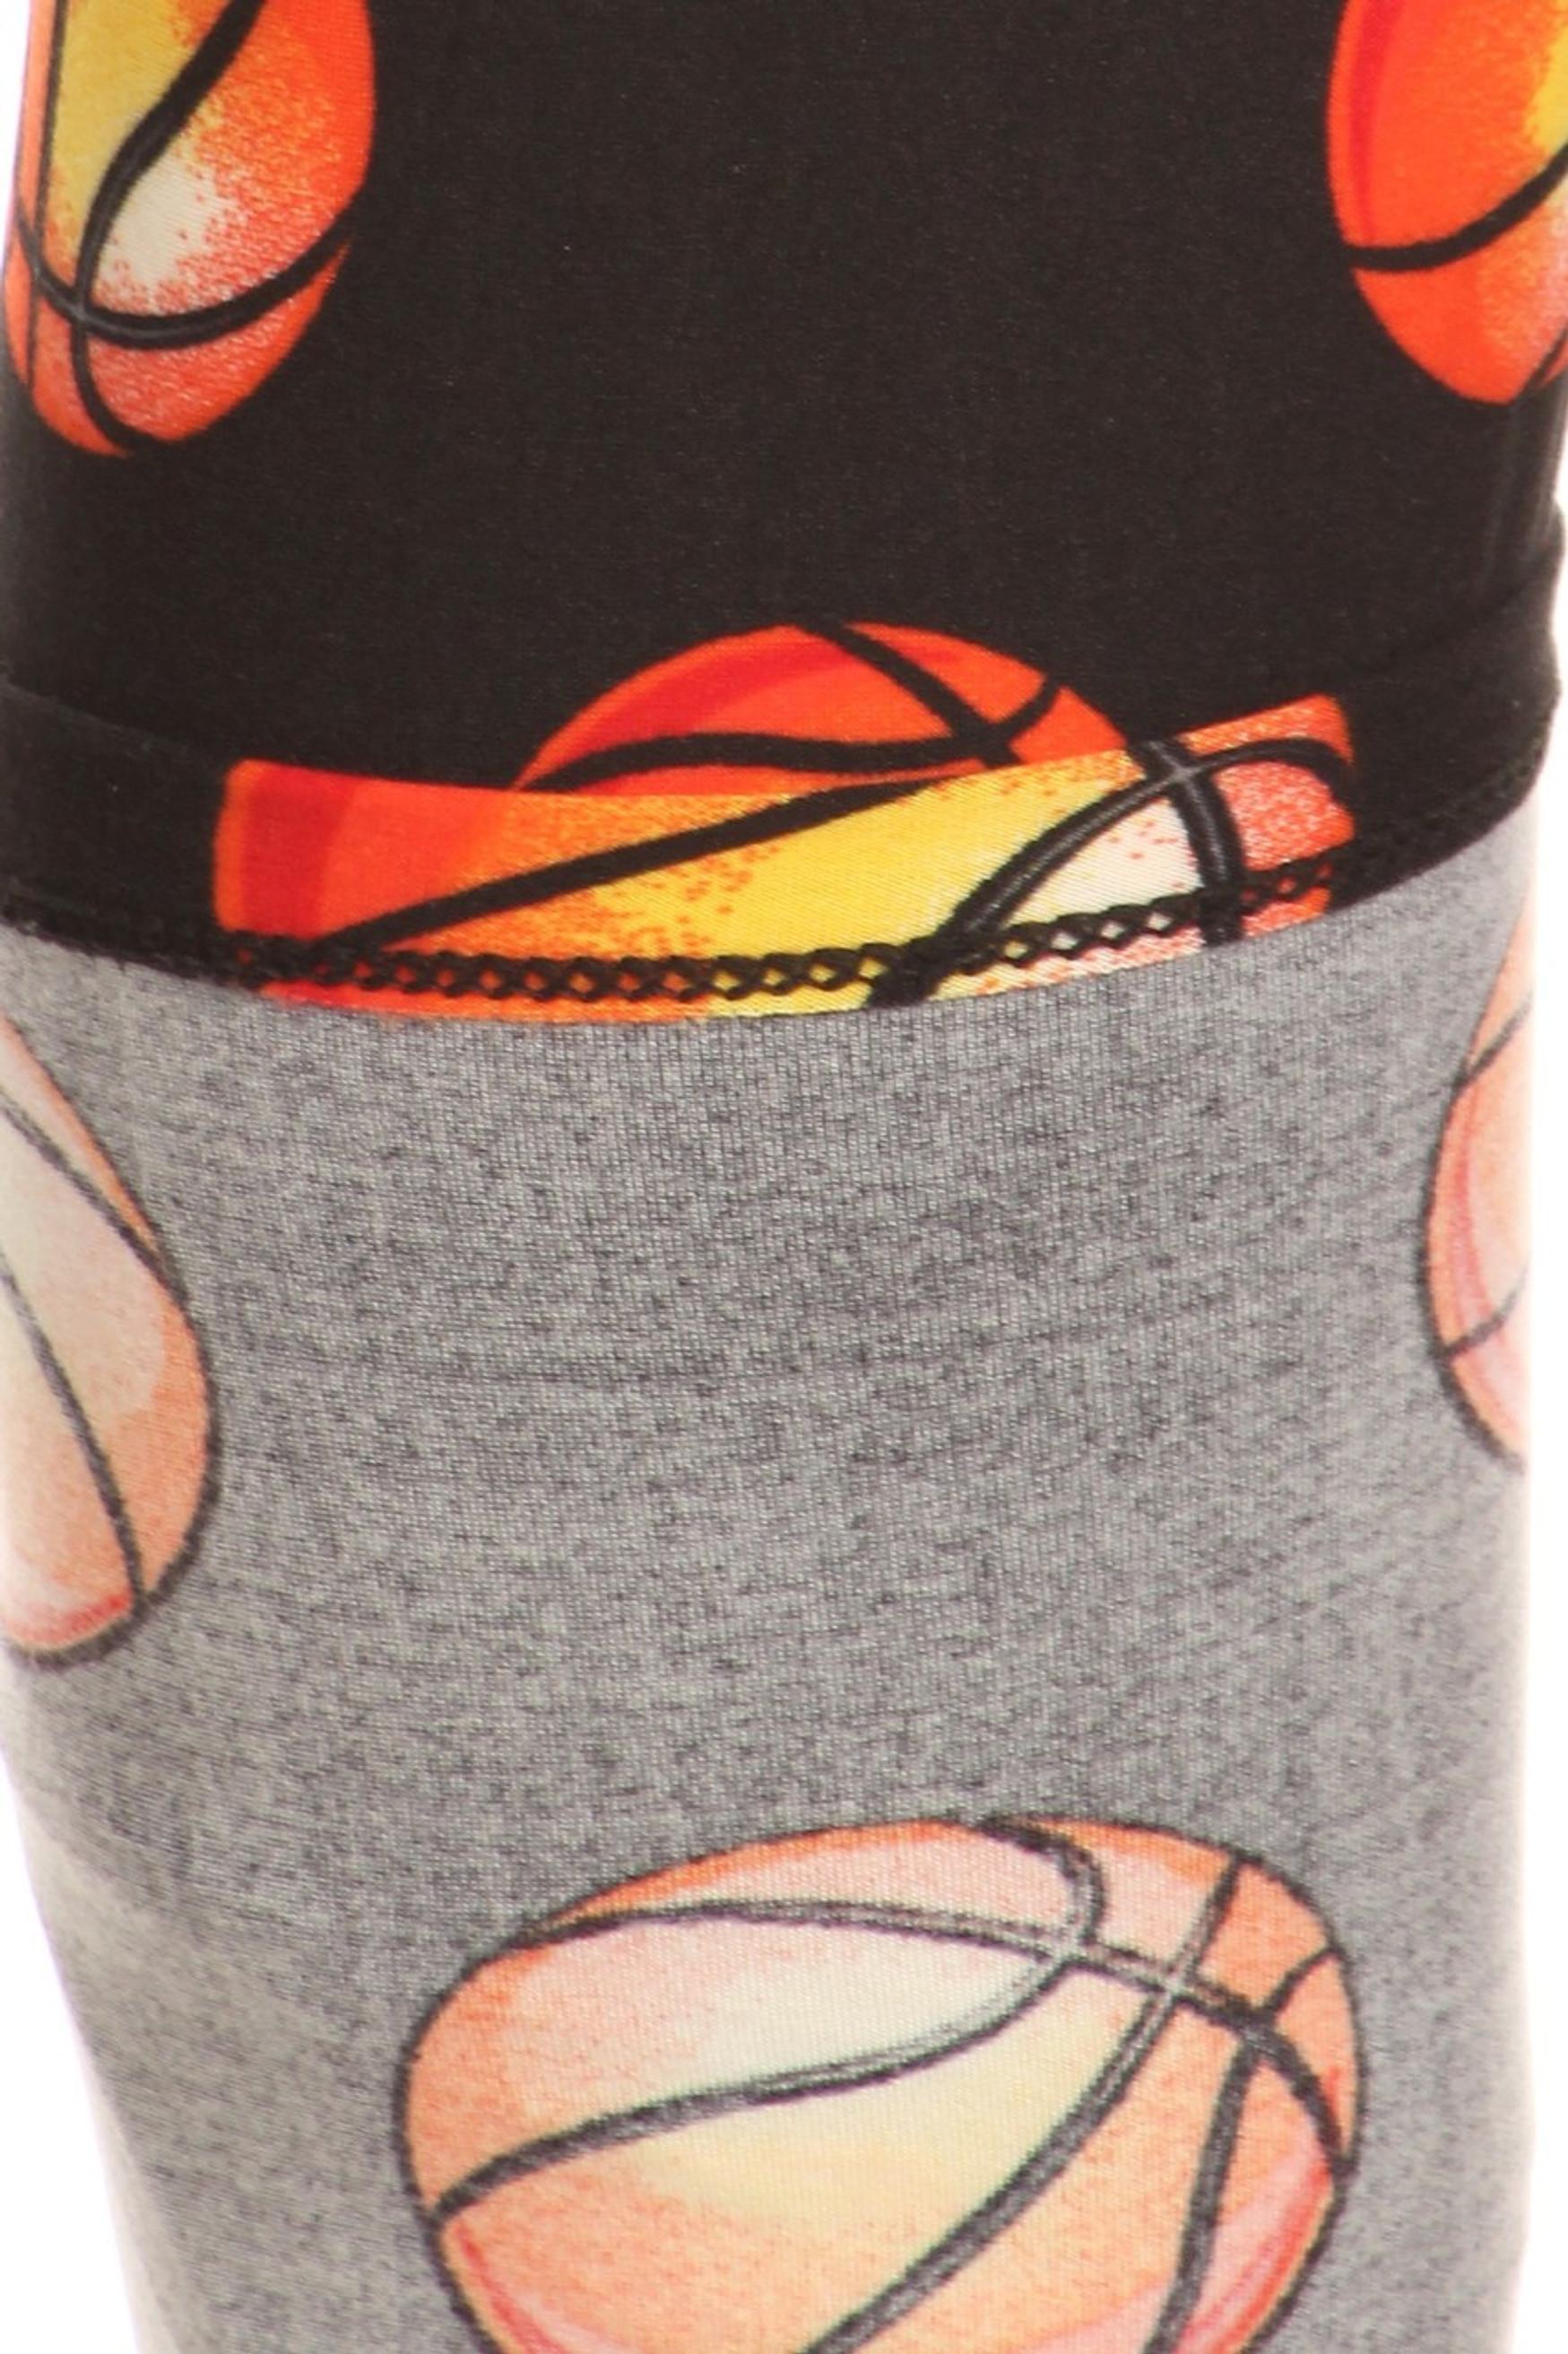 Brushed Basketball Plus Size Leggings - 3X-5X